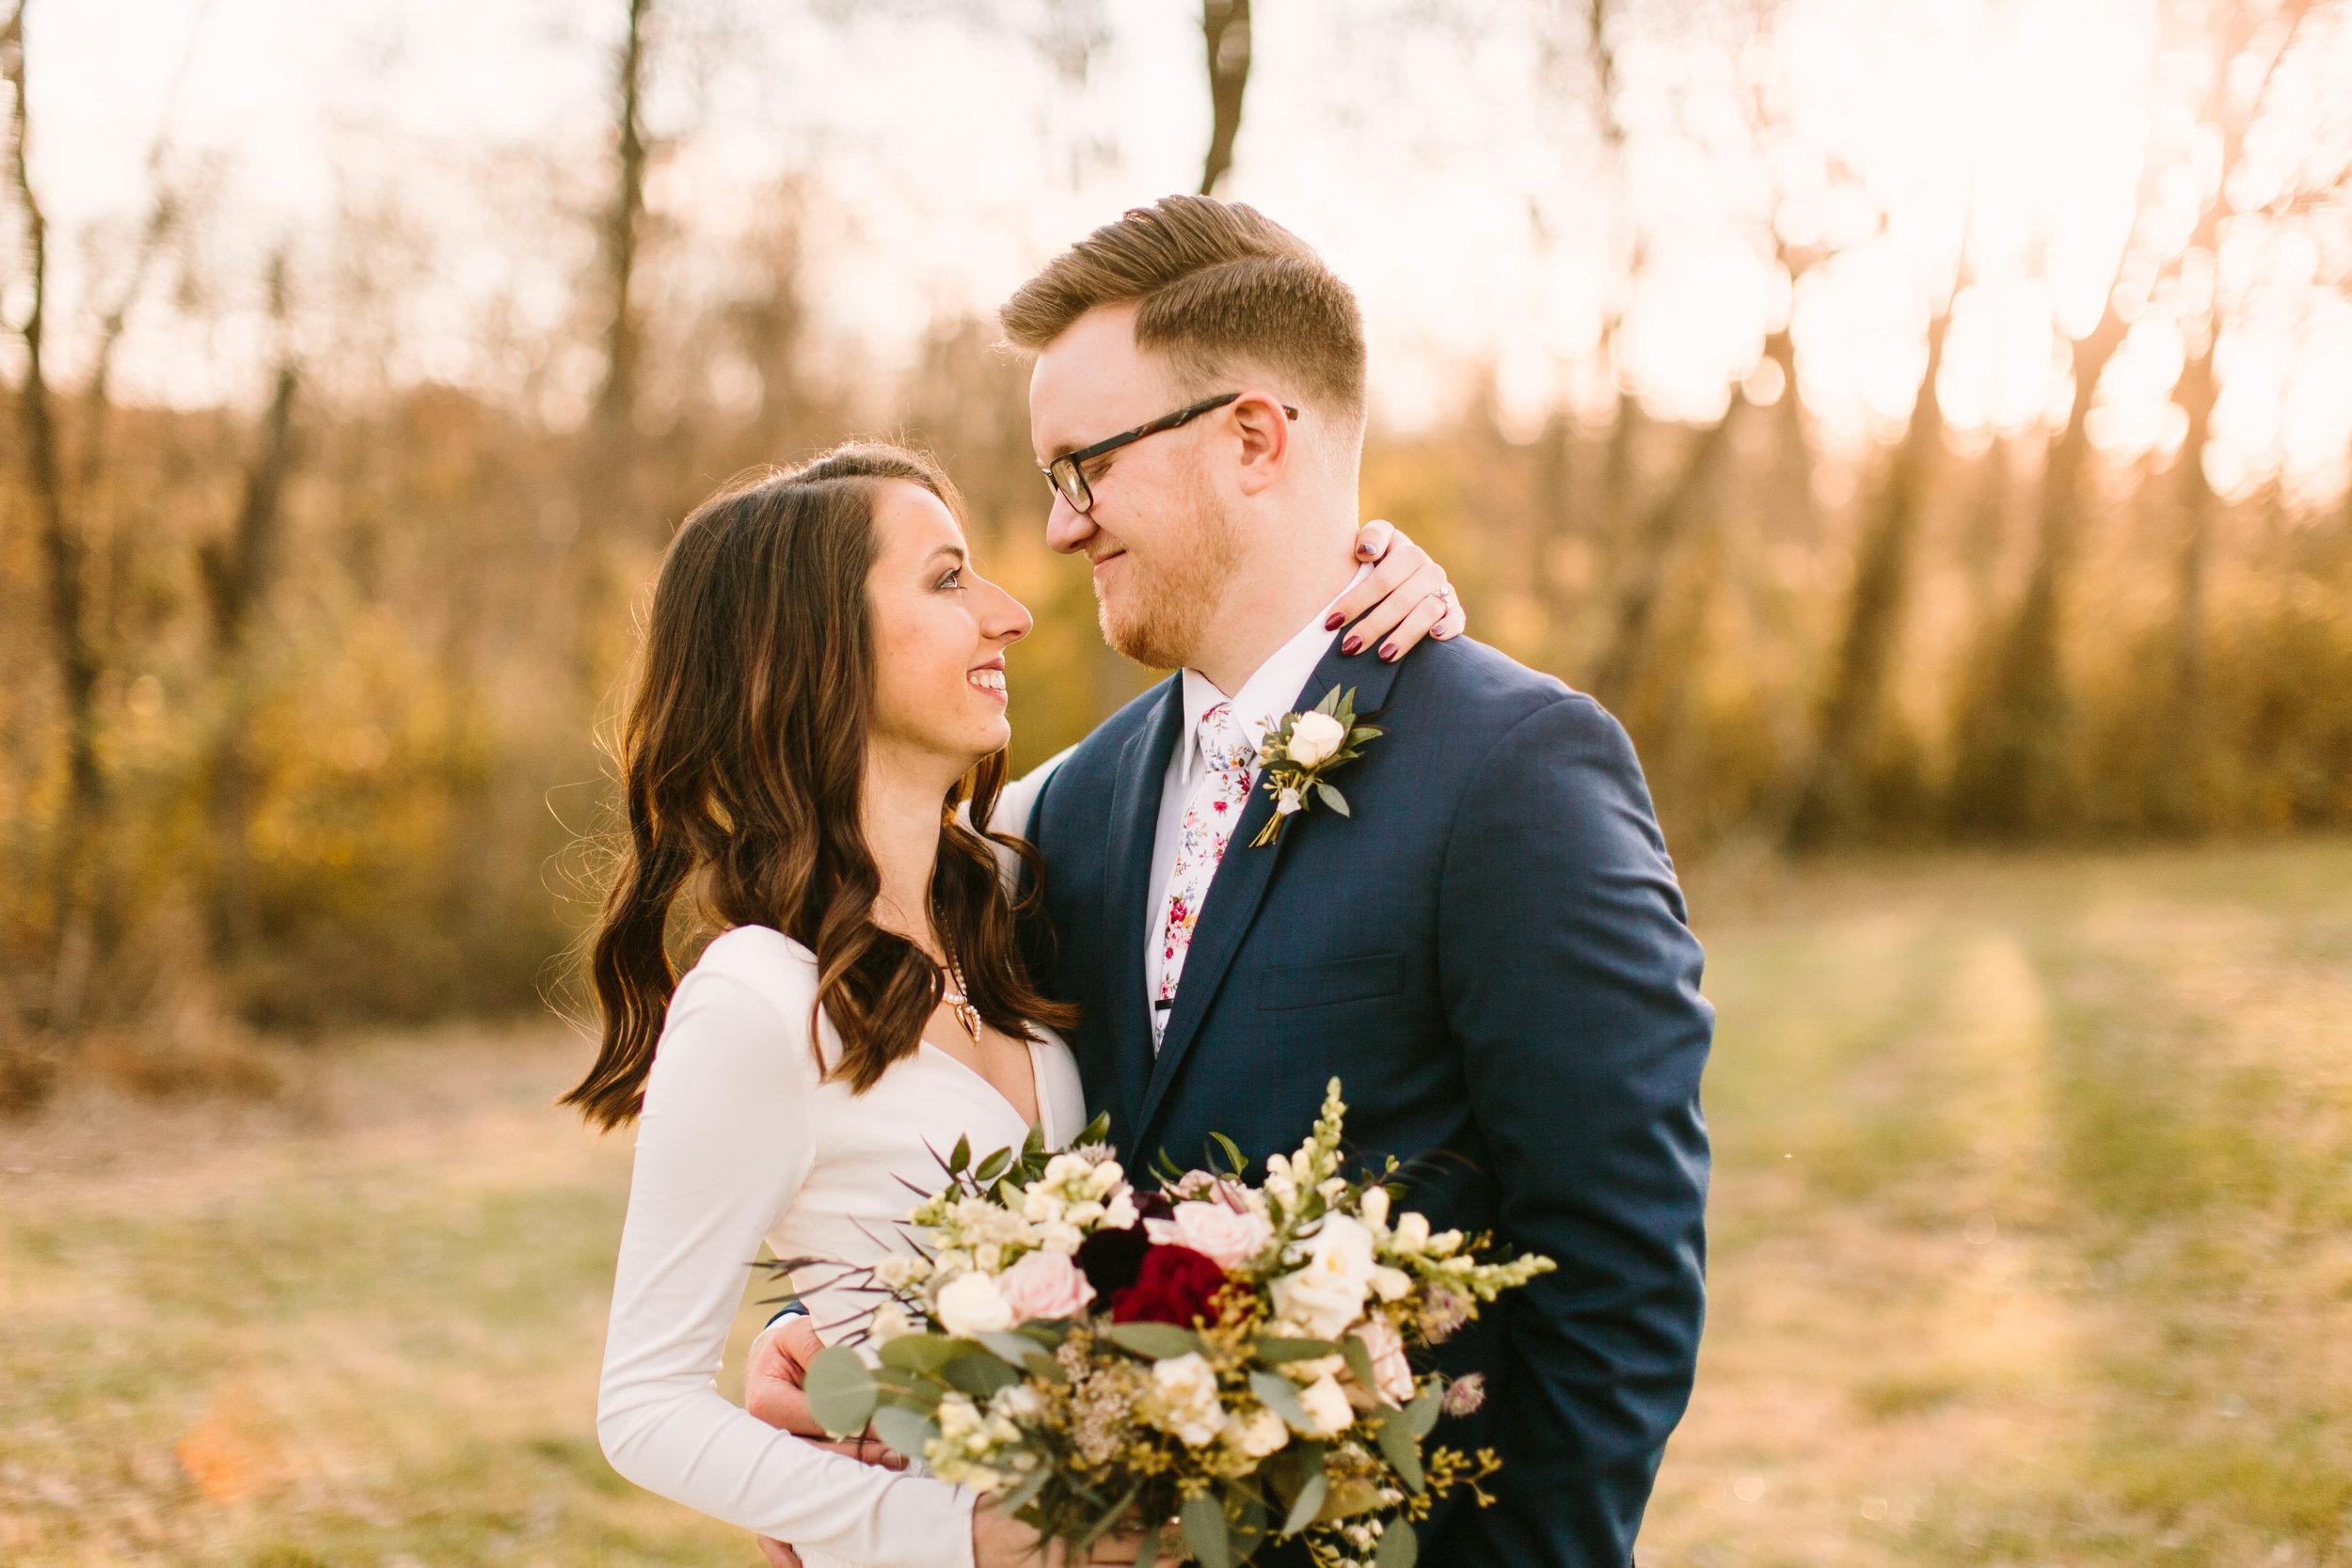 Veronica Young Photography, St. Louis wedding photographer, fall wedding inspo